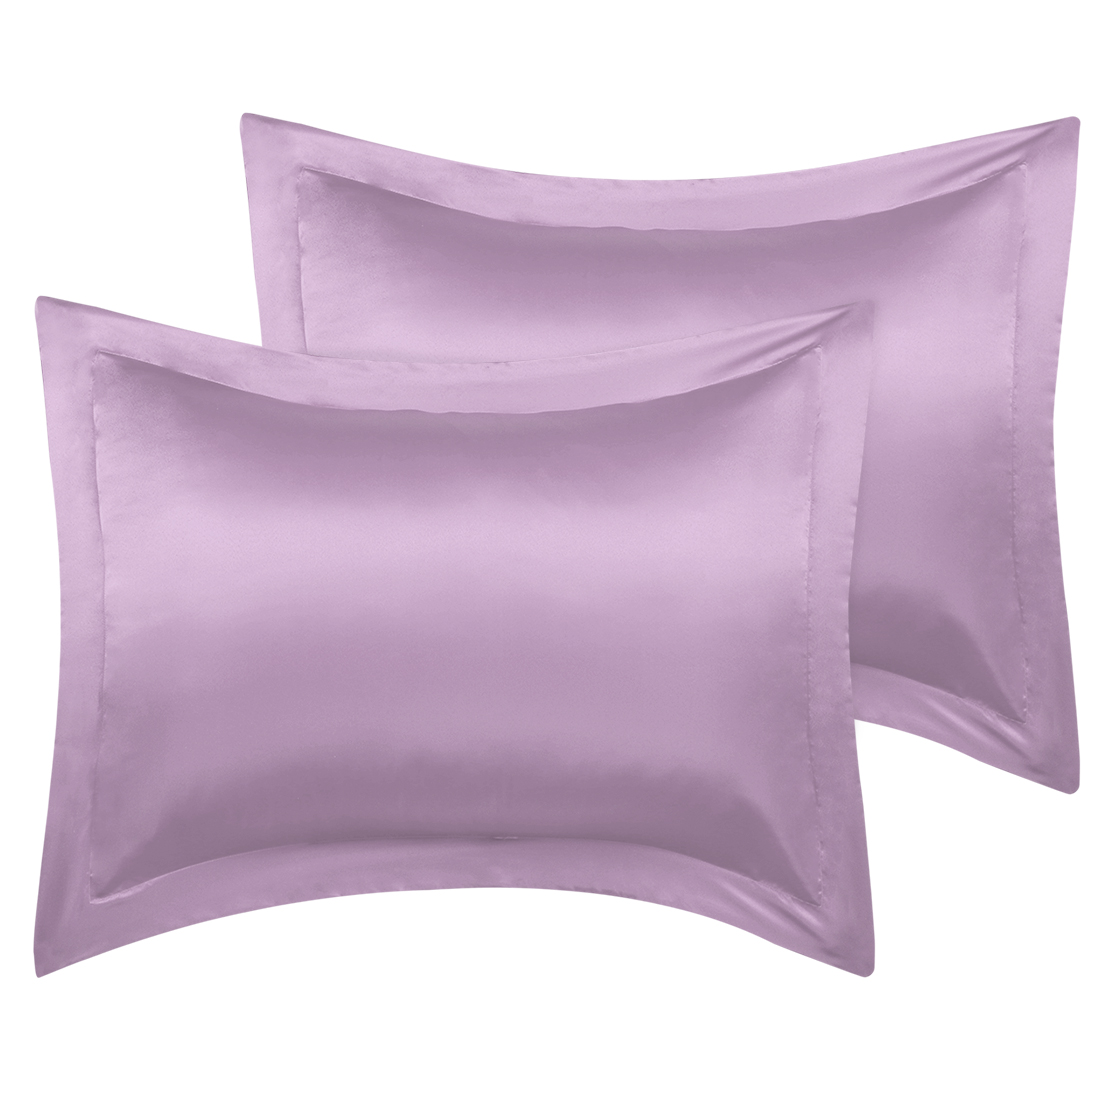 2 Pcs Mauve Pillow Shams Satin Pillow Cases Queen Oxford Pillowcases